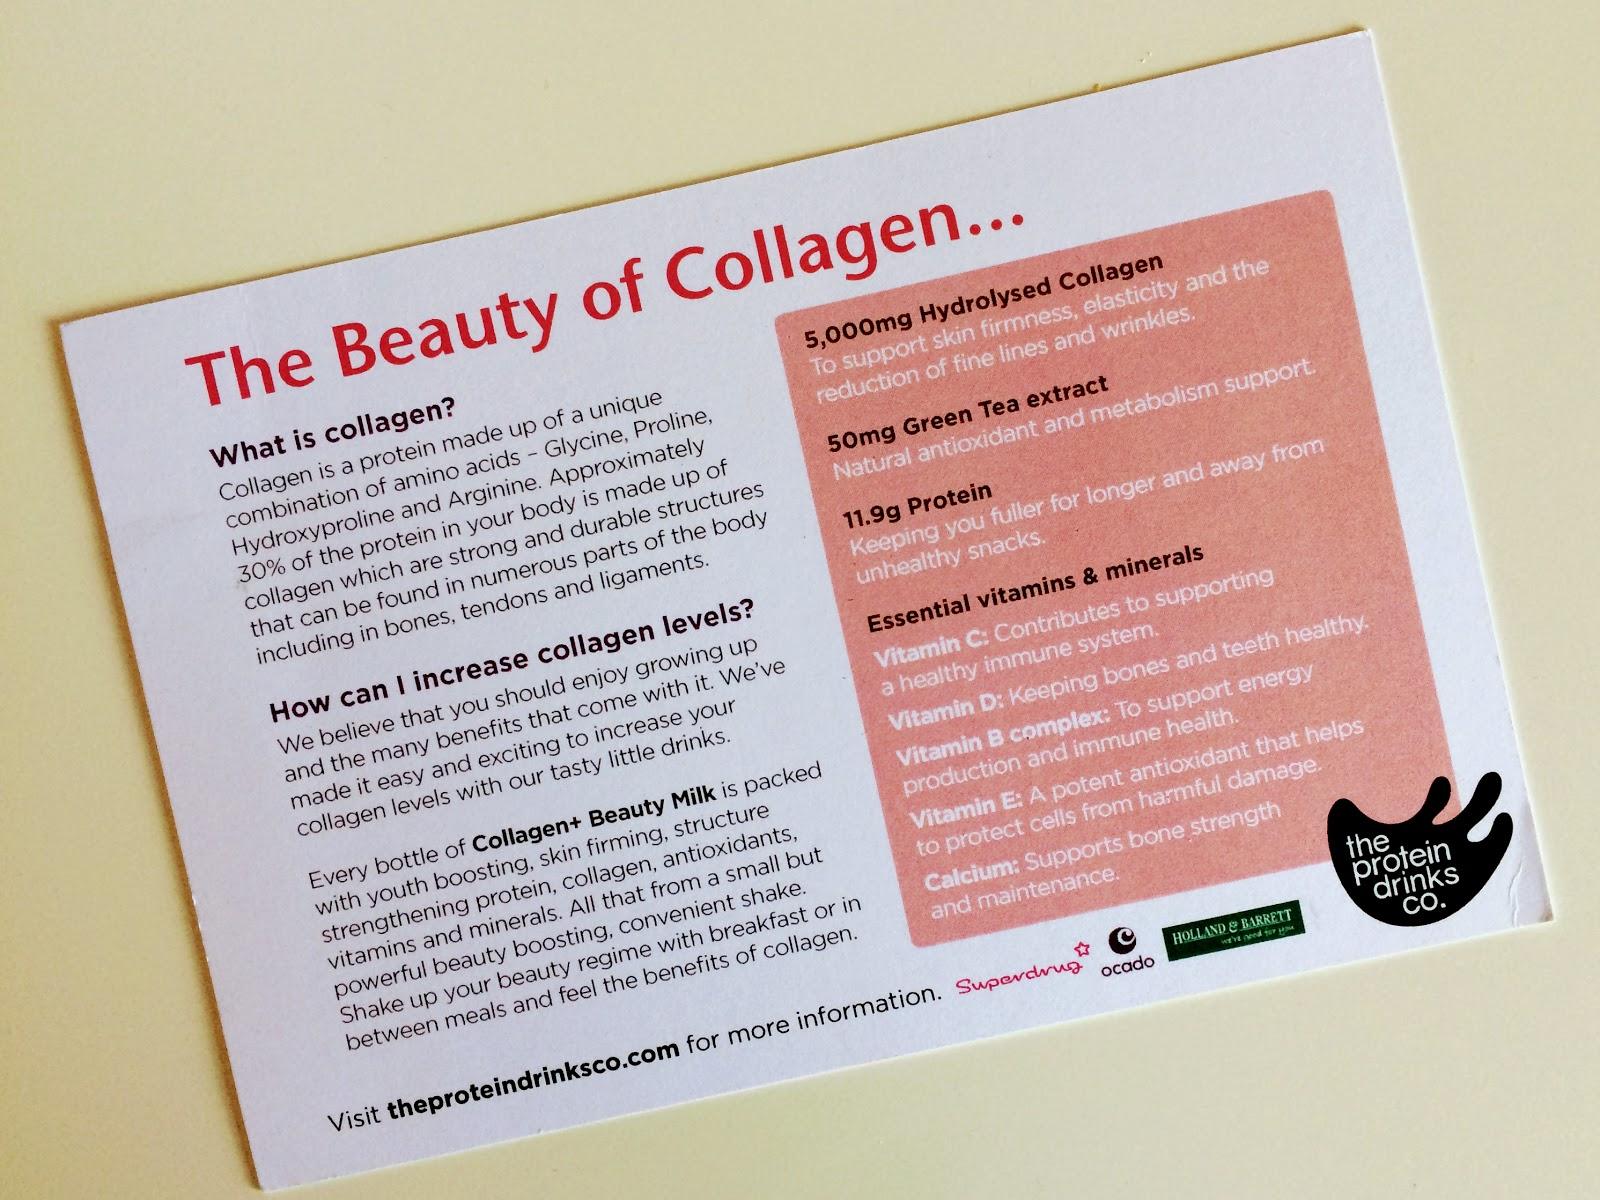 Collagen Beauty Milk info card